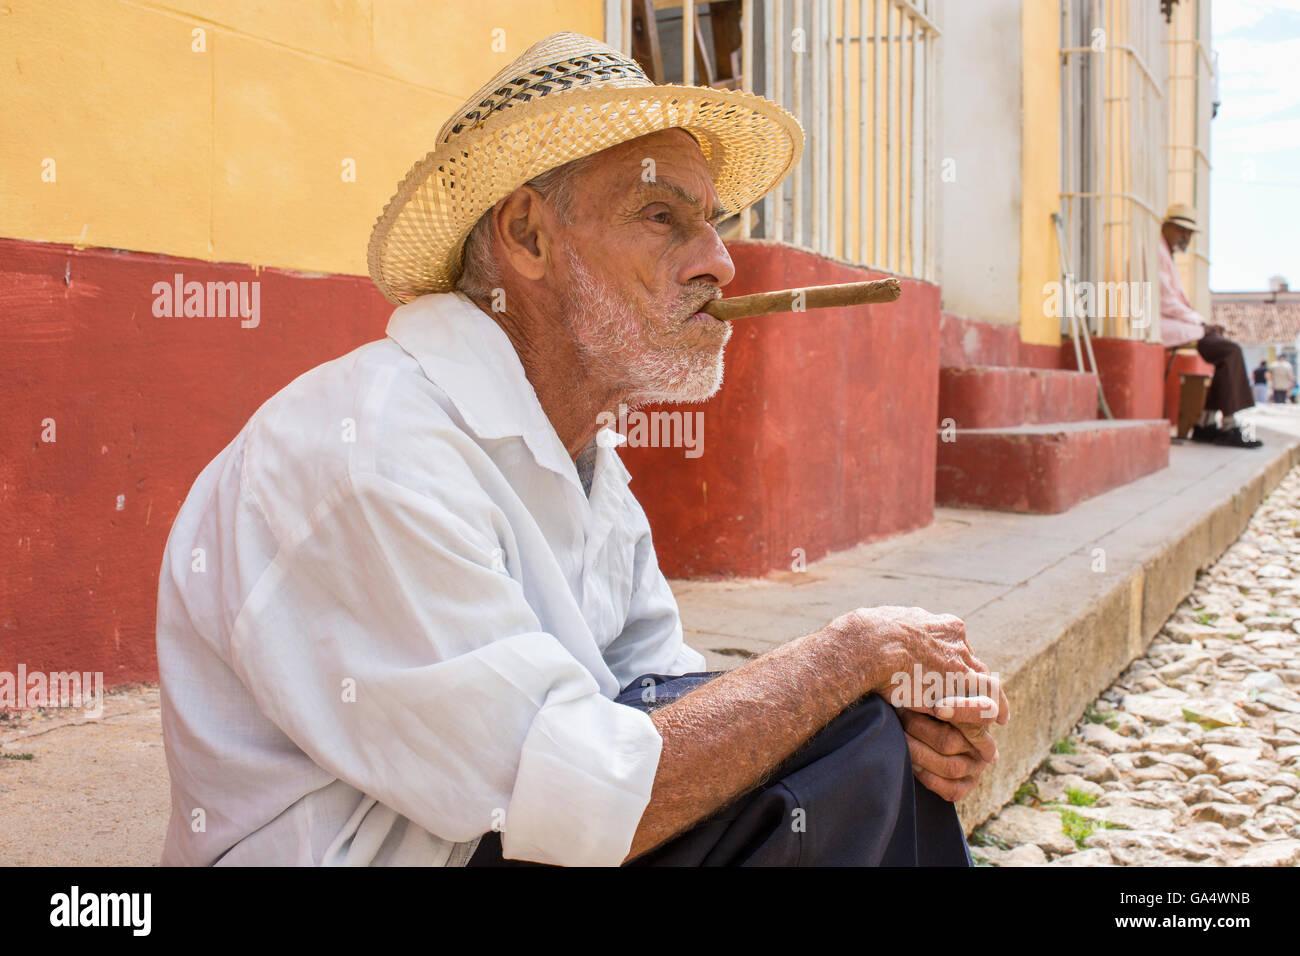 Uomo locale in hat con sigaro seduti sul marciapiede in Plaza Major, Trinidad, Cuba Immagini Stock